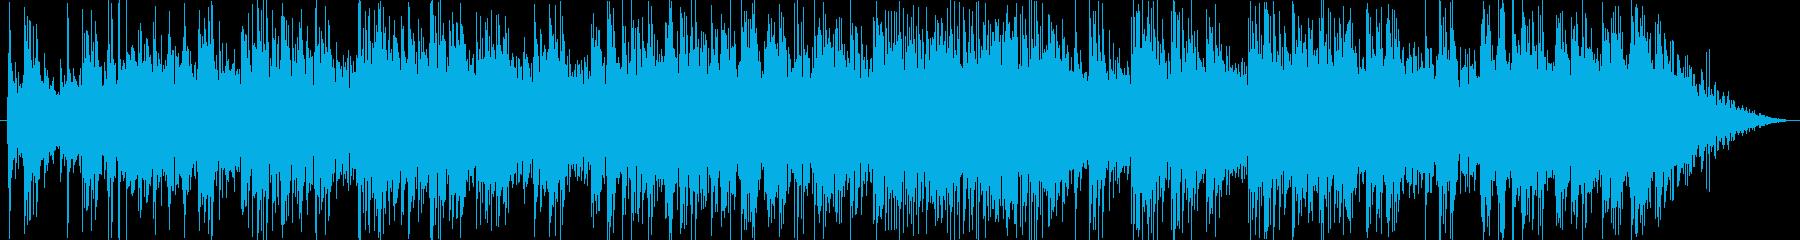 Medium tempo guitar pops's reproduced waveform